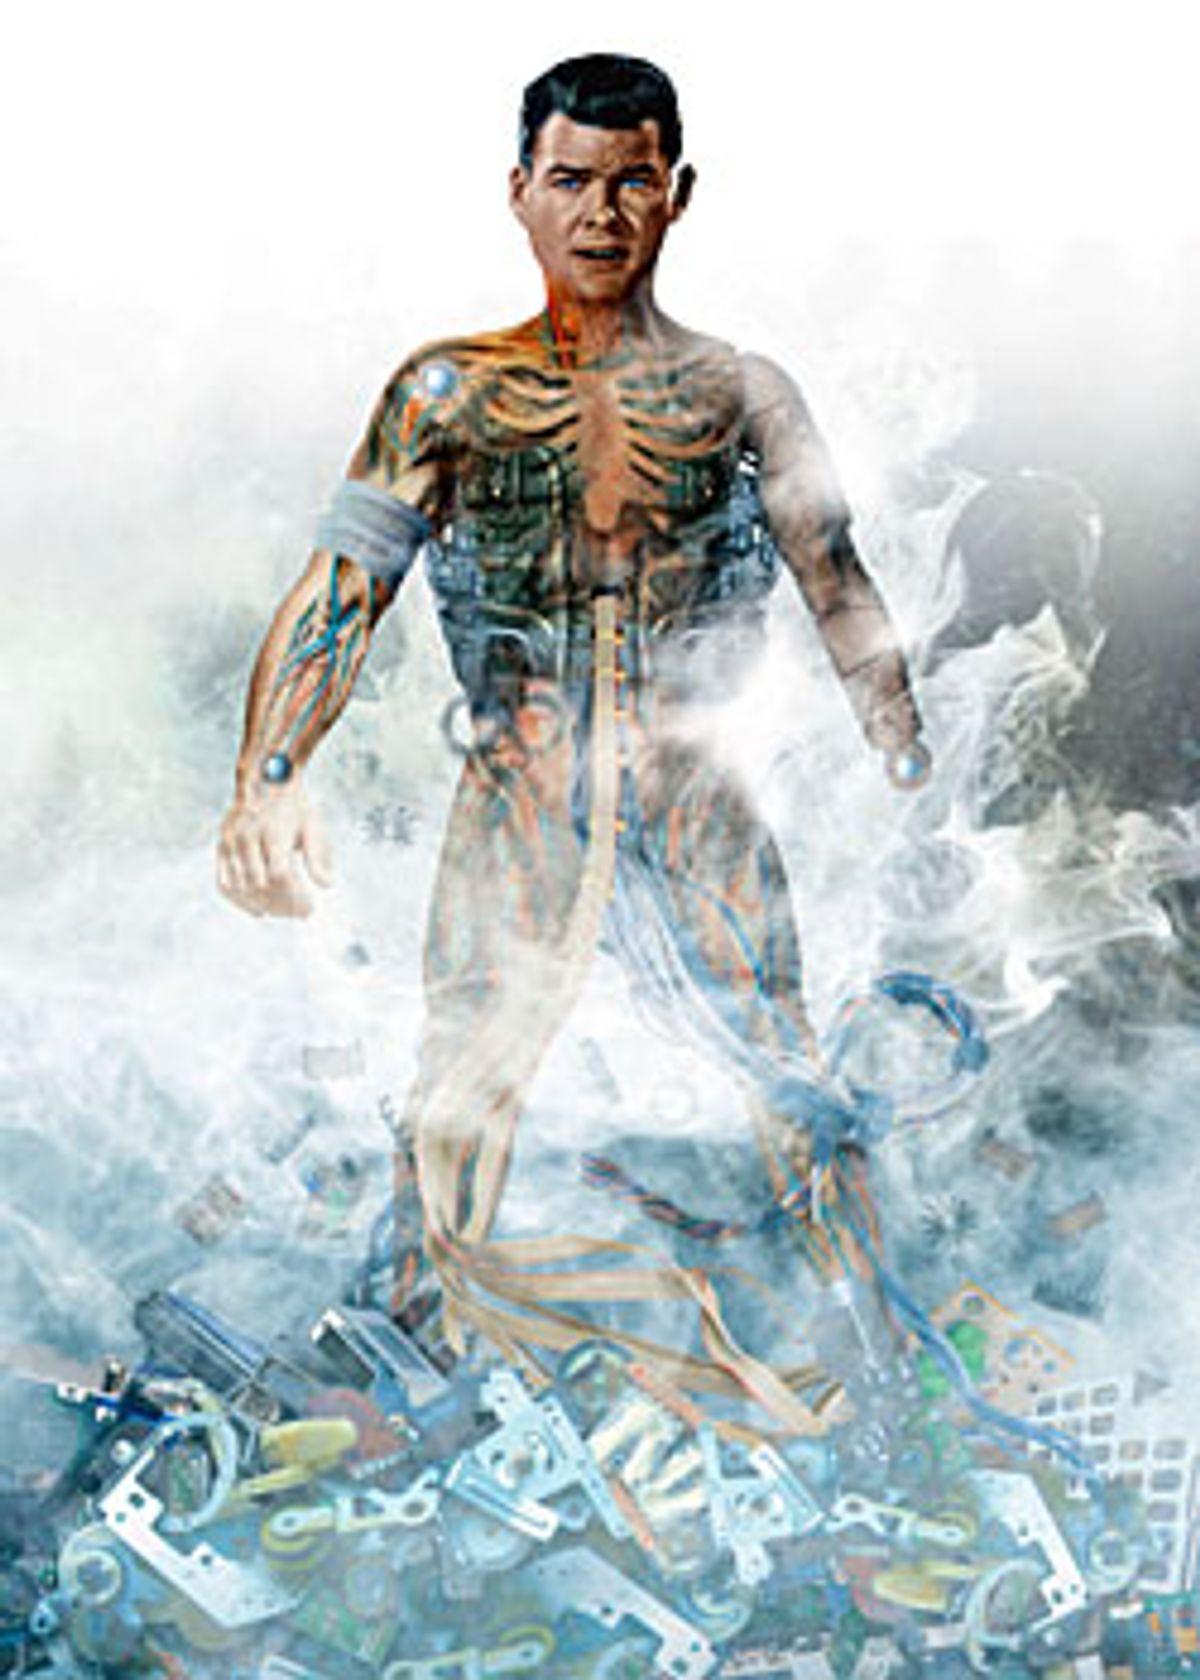 Illustration of human